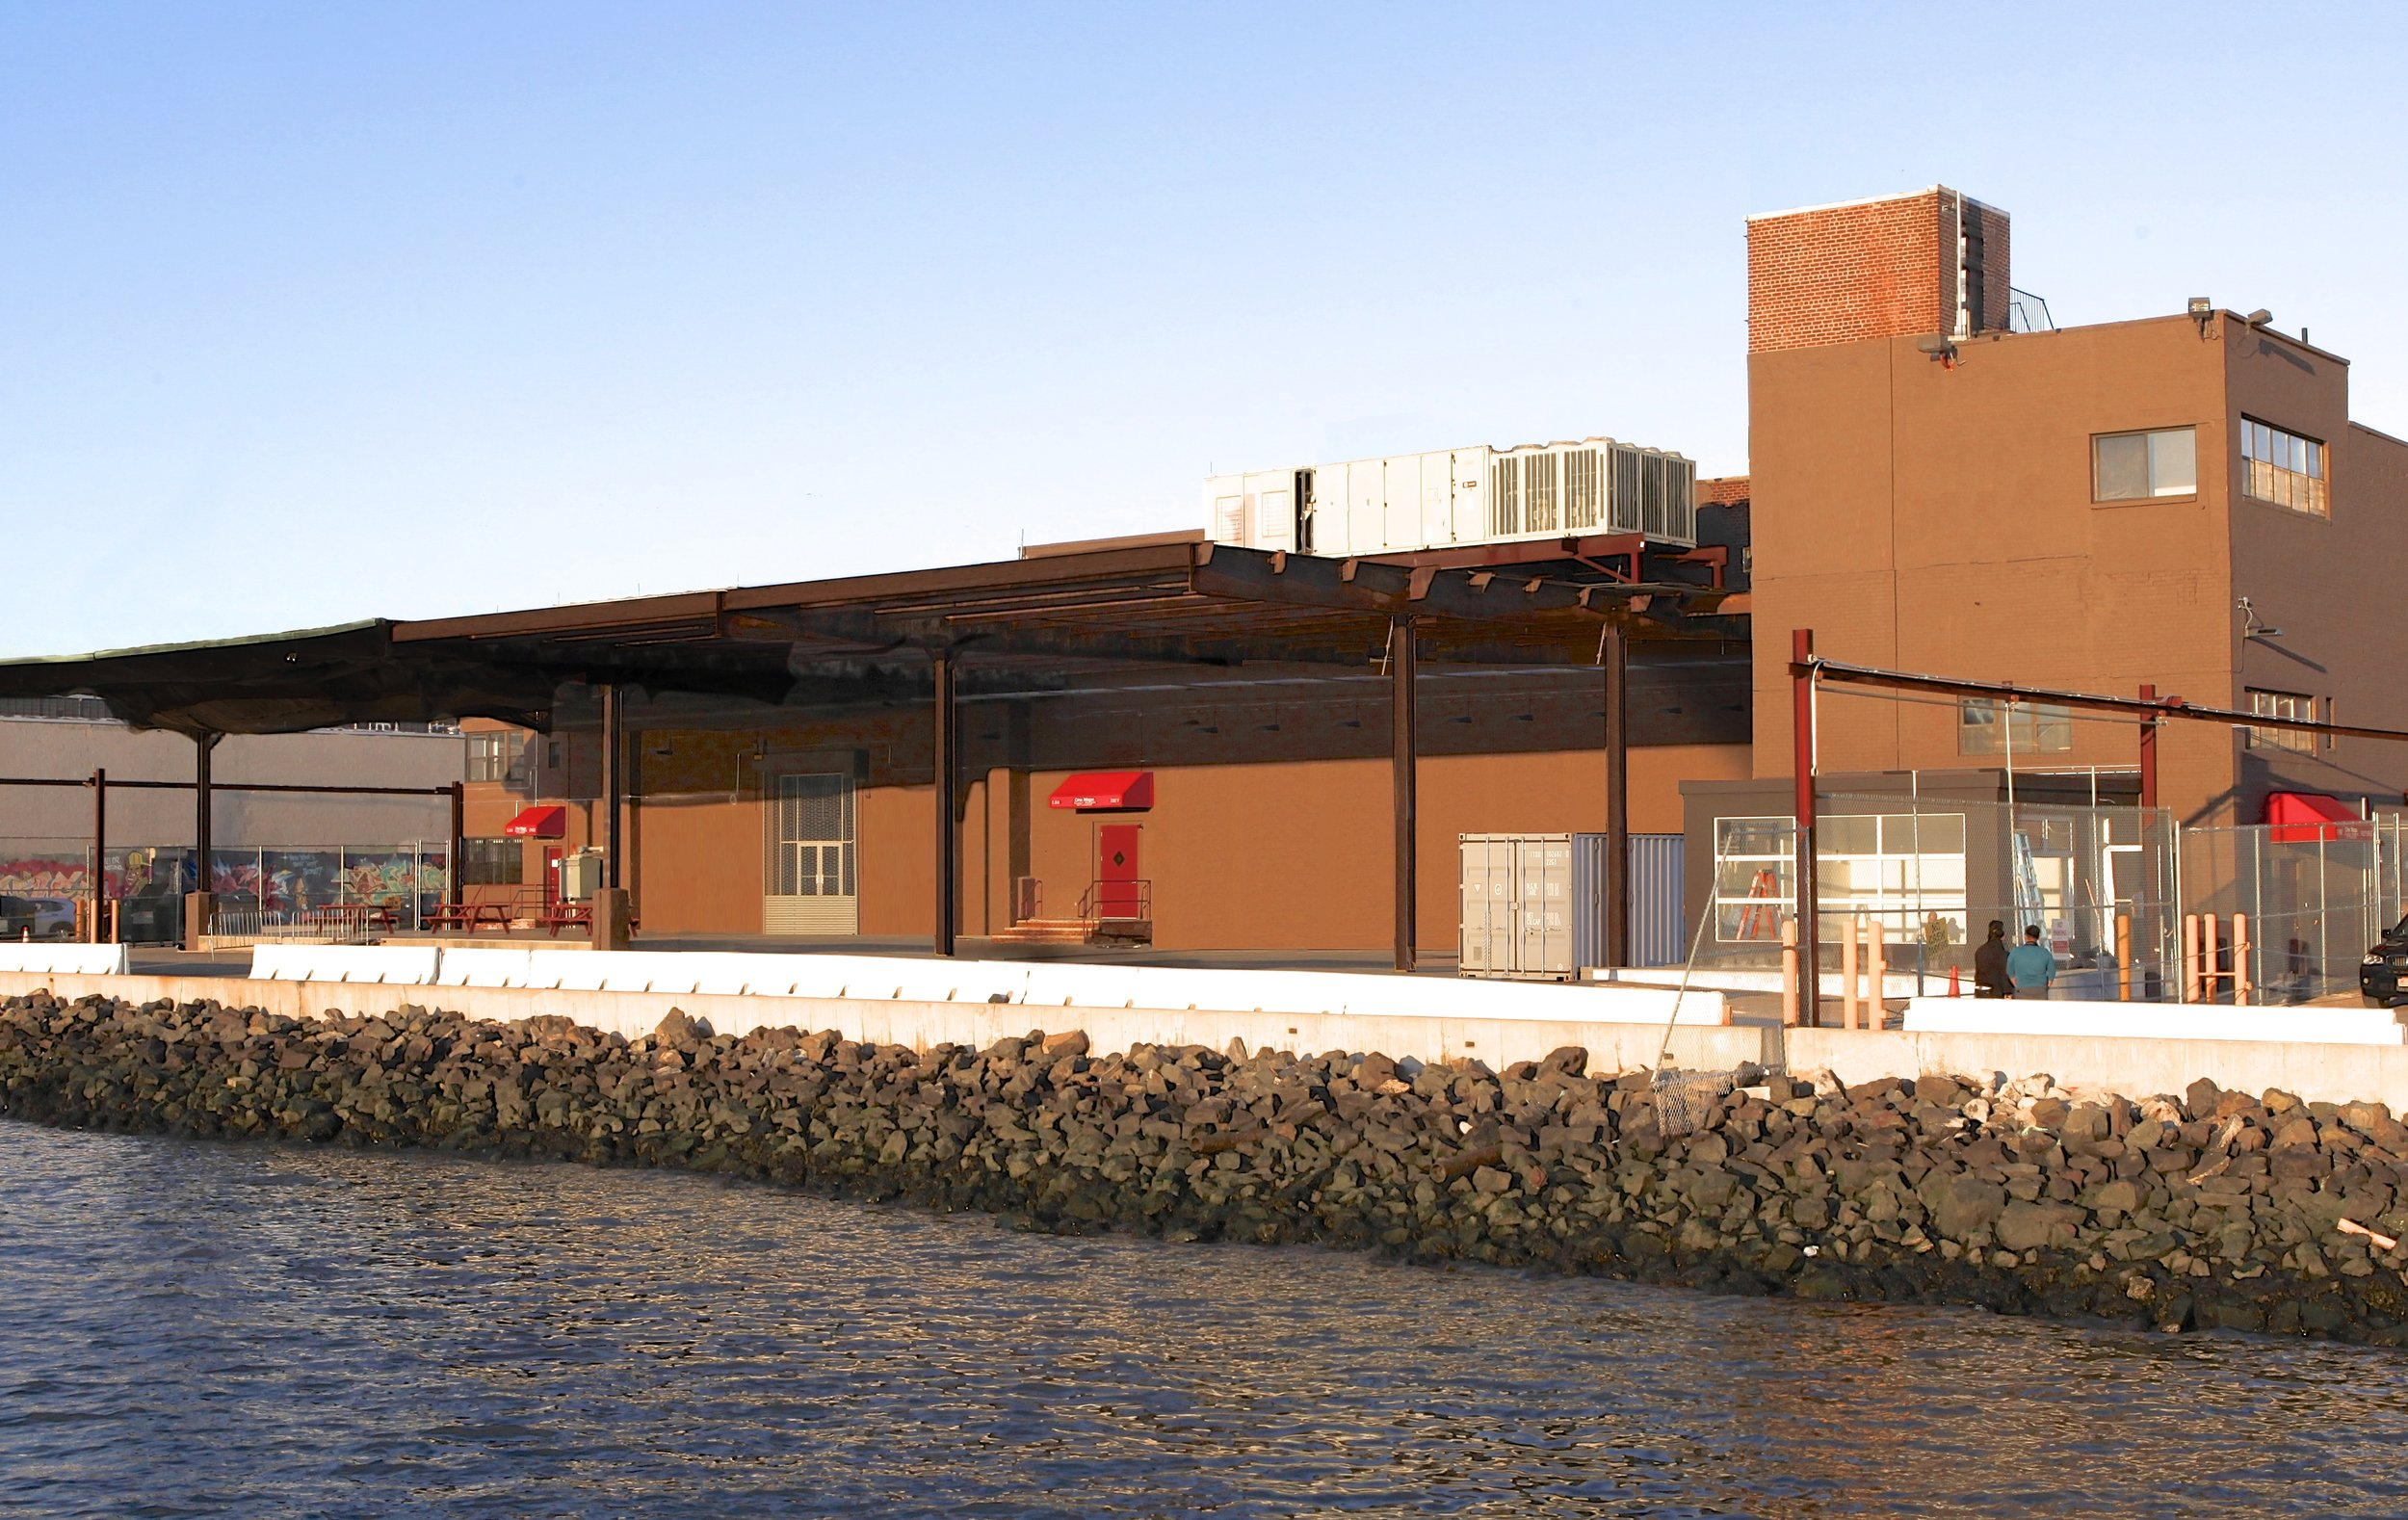 riverfront revised 2.jpg